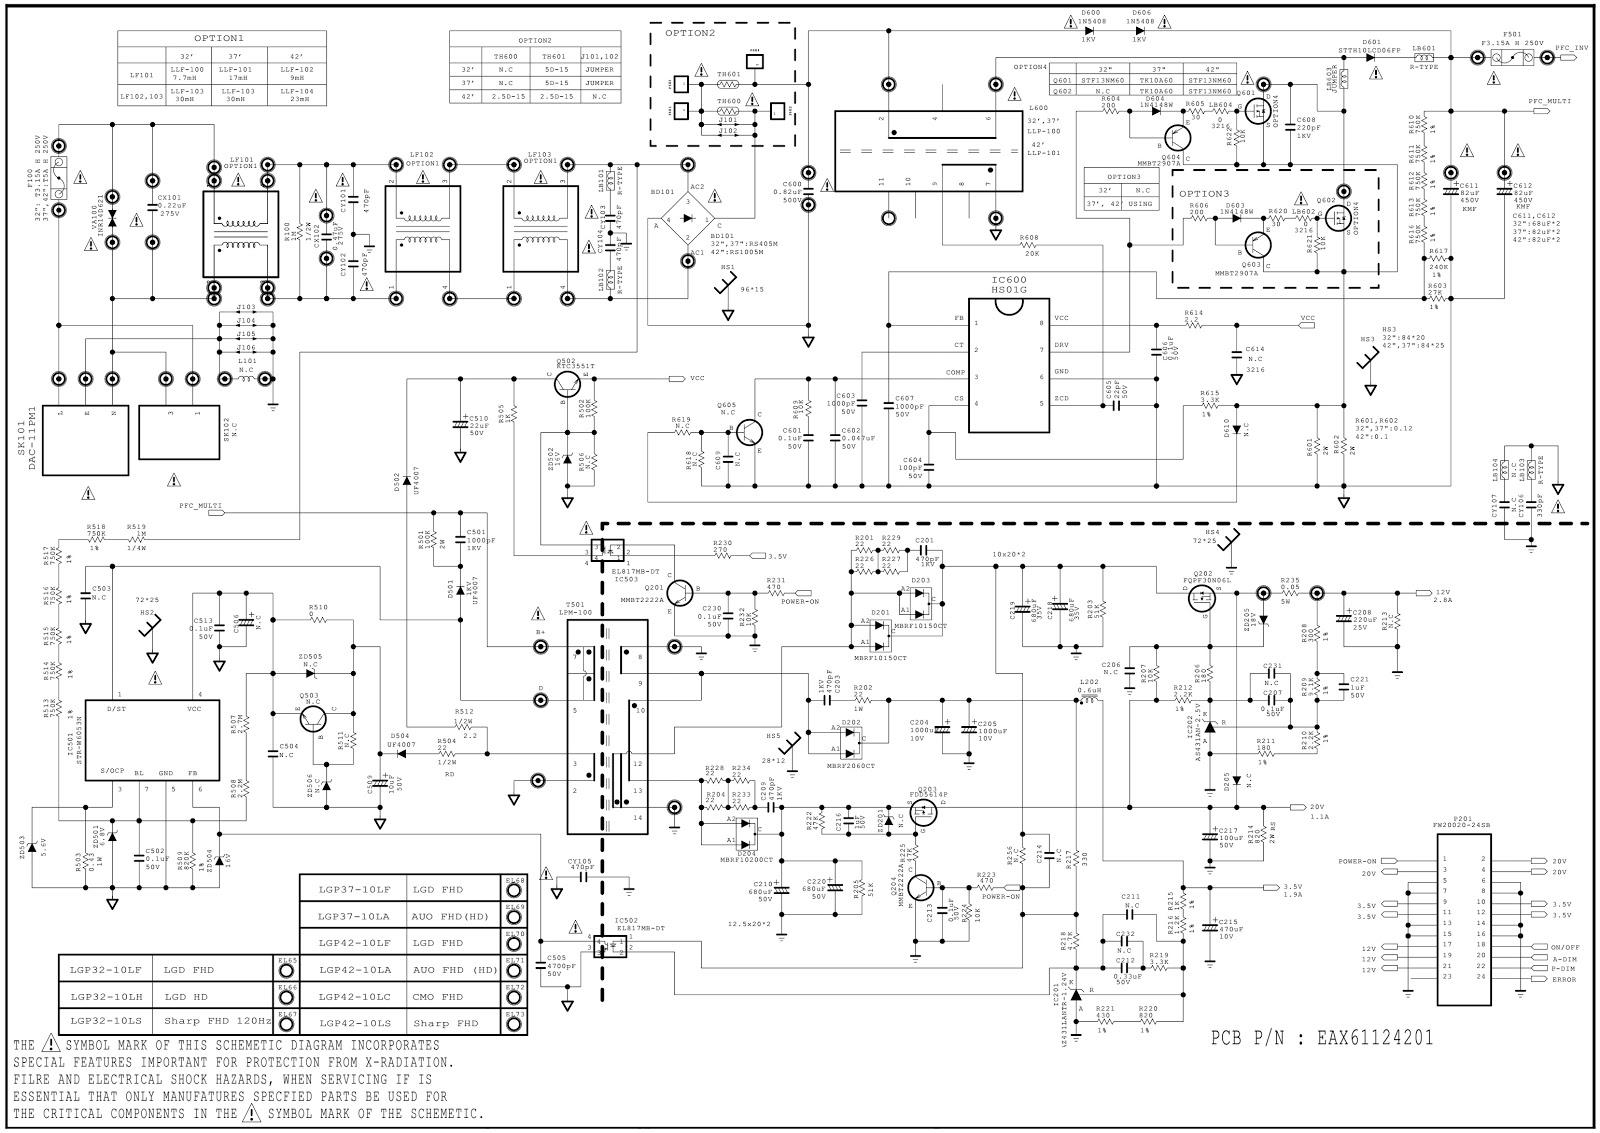 Lg Lcd Tv Smps Eay60869402 Eay60869403 Eay60869405 Circuit Electrical Diagram Symbols